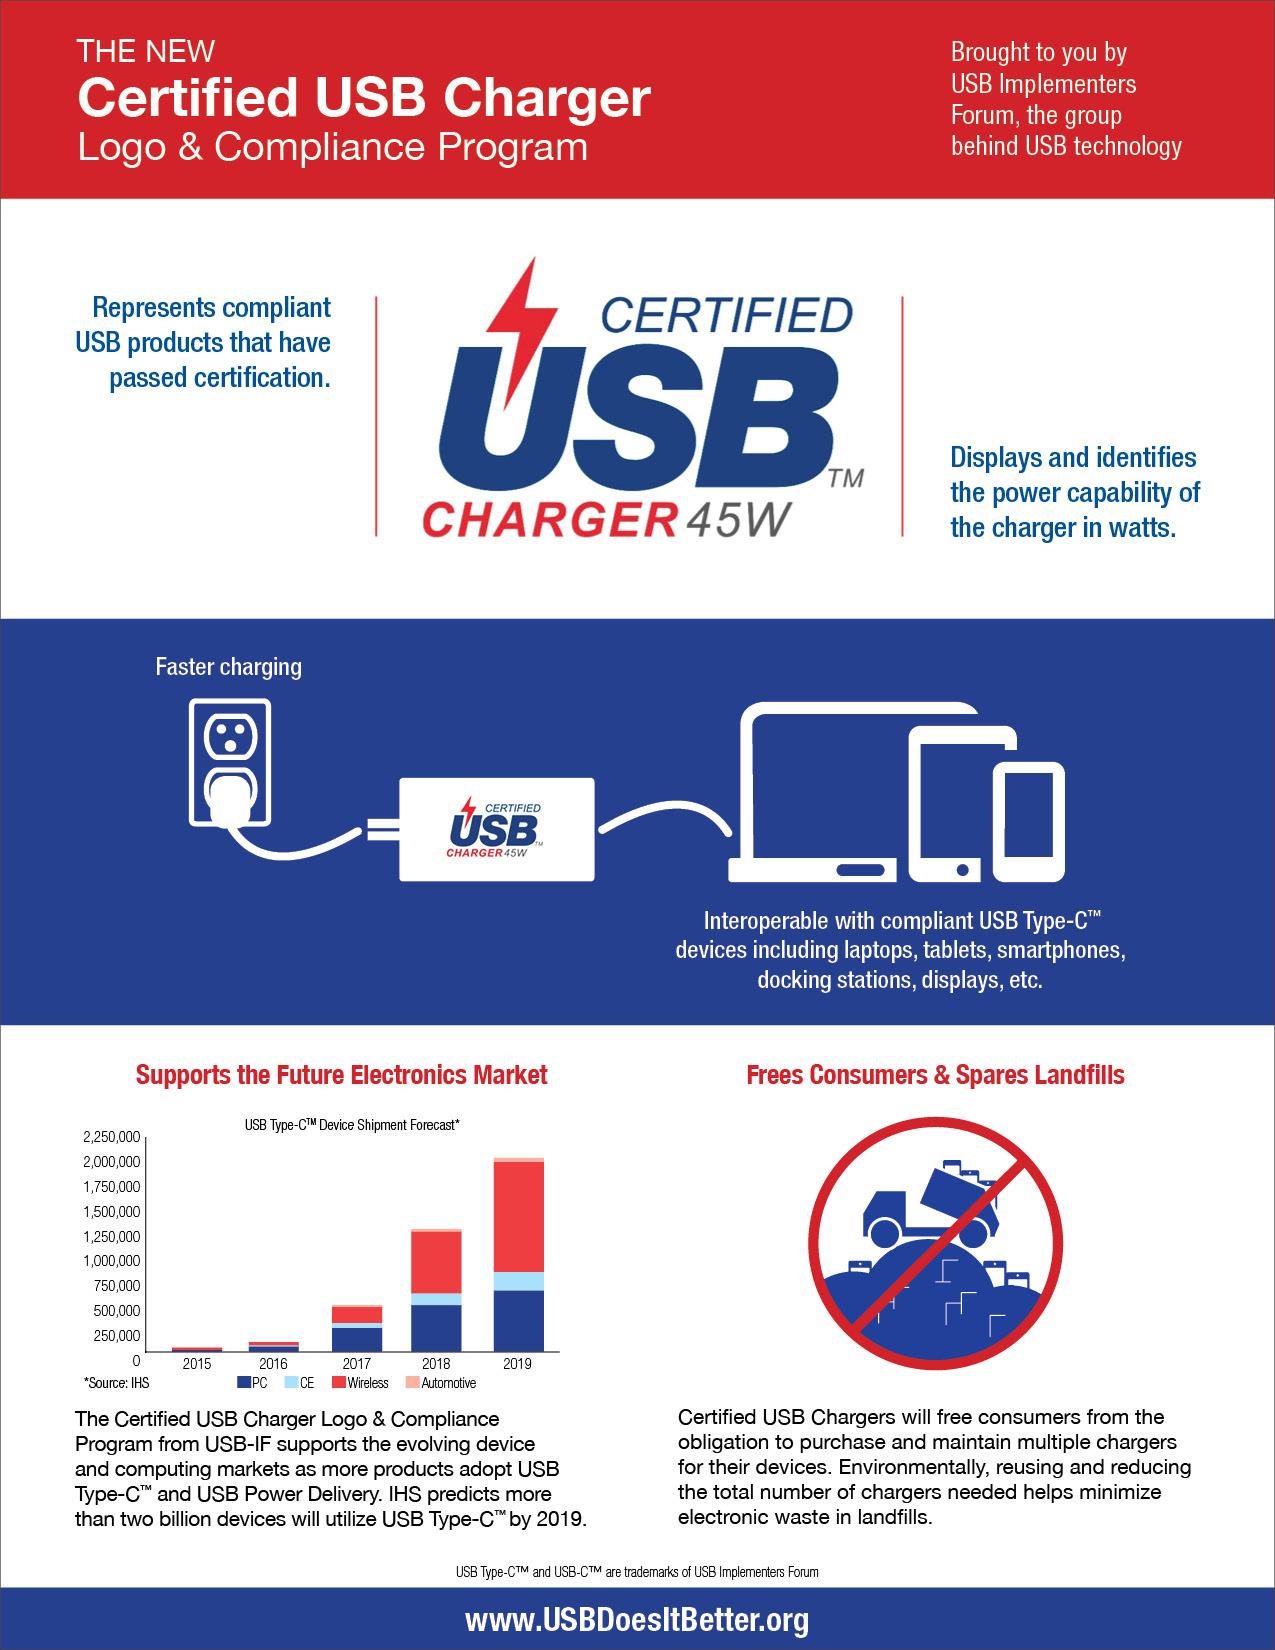 IF Announce USB Type-C Compliance Program & Logo